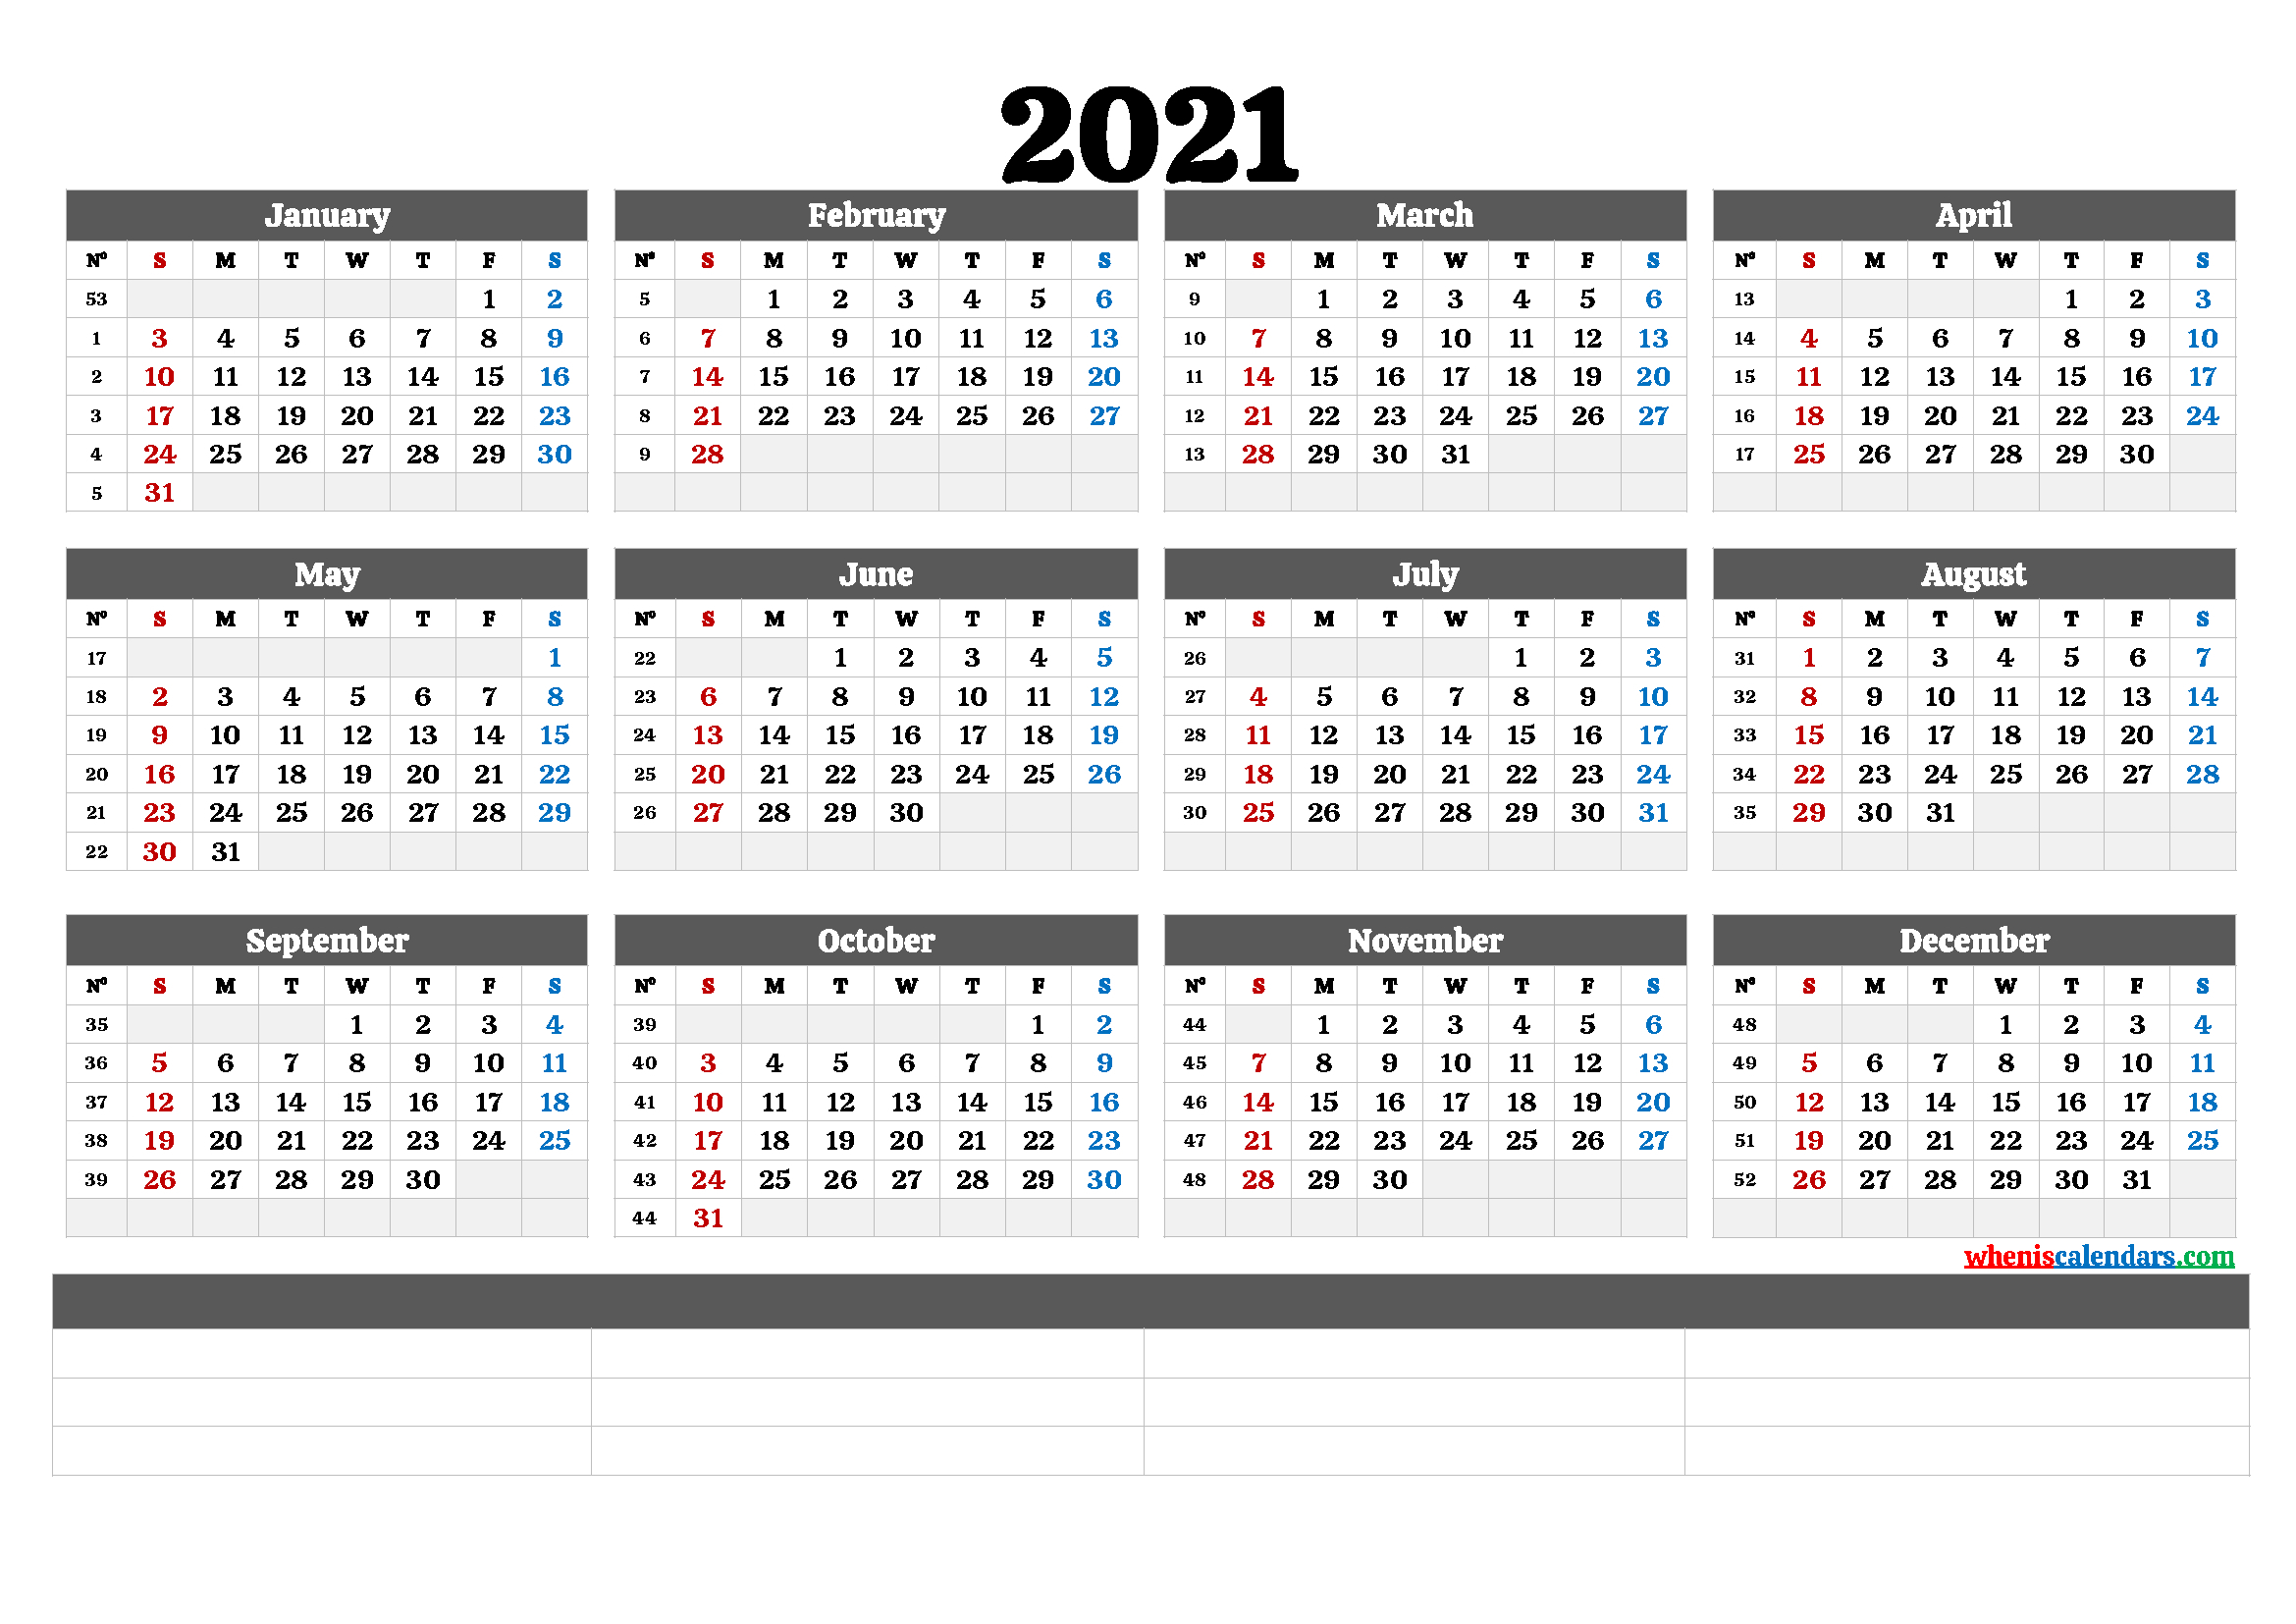 2021 Annual Calendar Printable (6 Templates) | Free